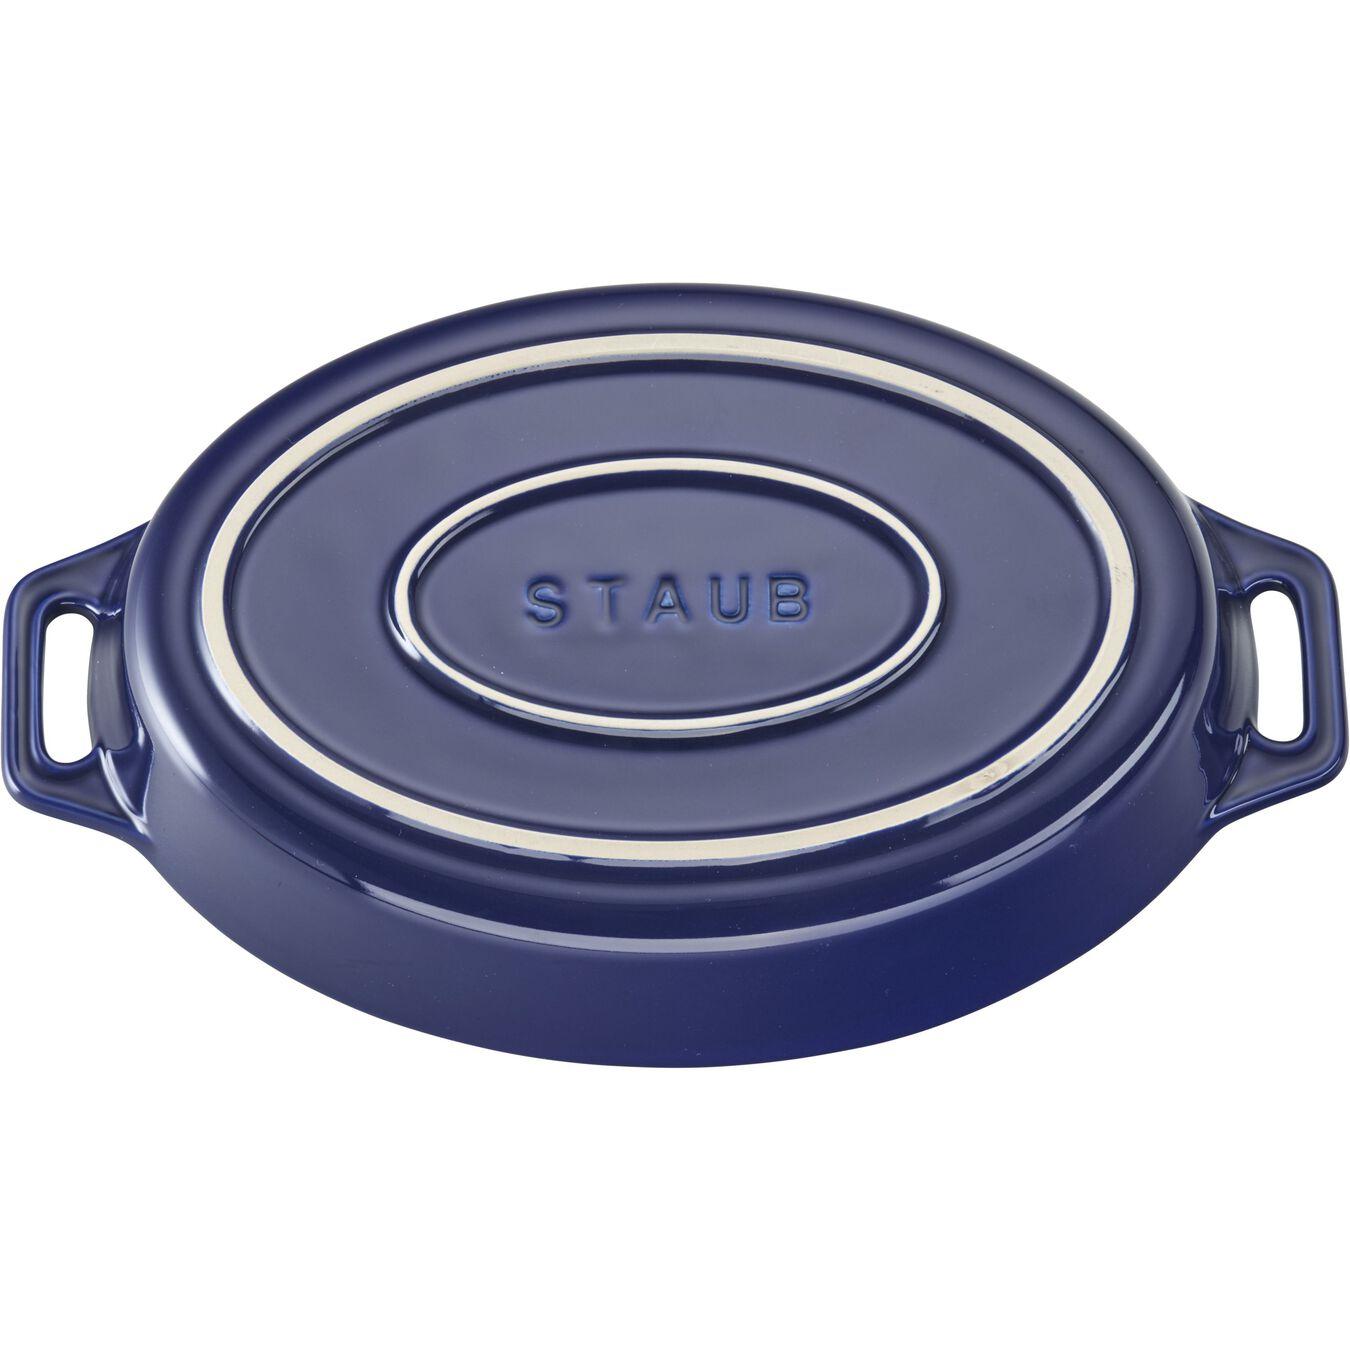 9-inch Oval Baking Dish - Dark Blue,,large 2